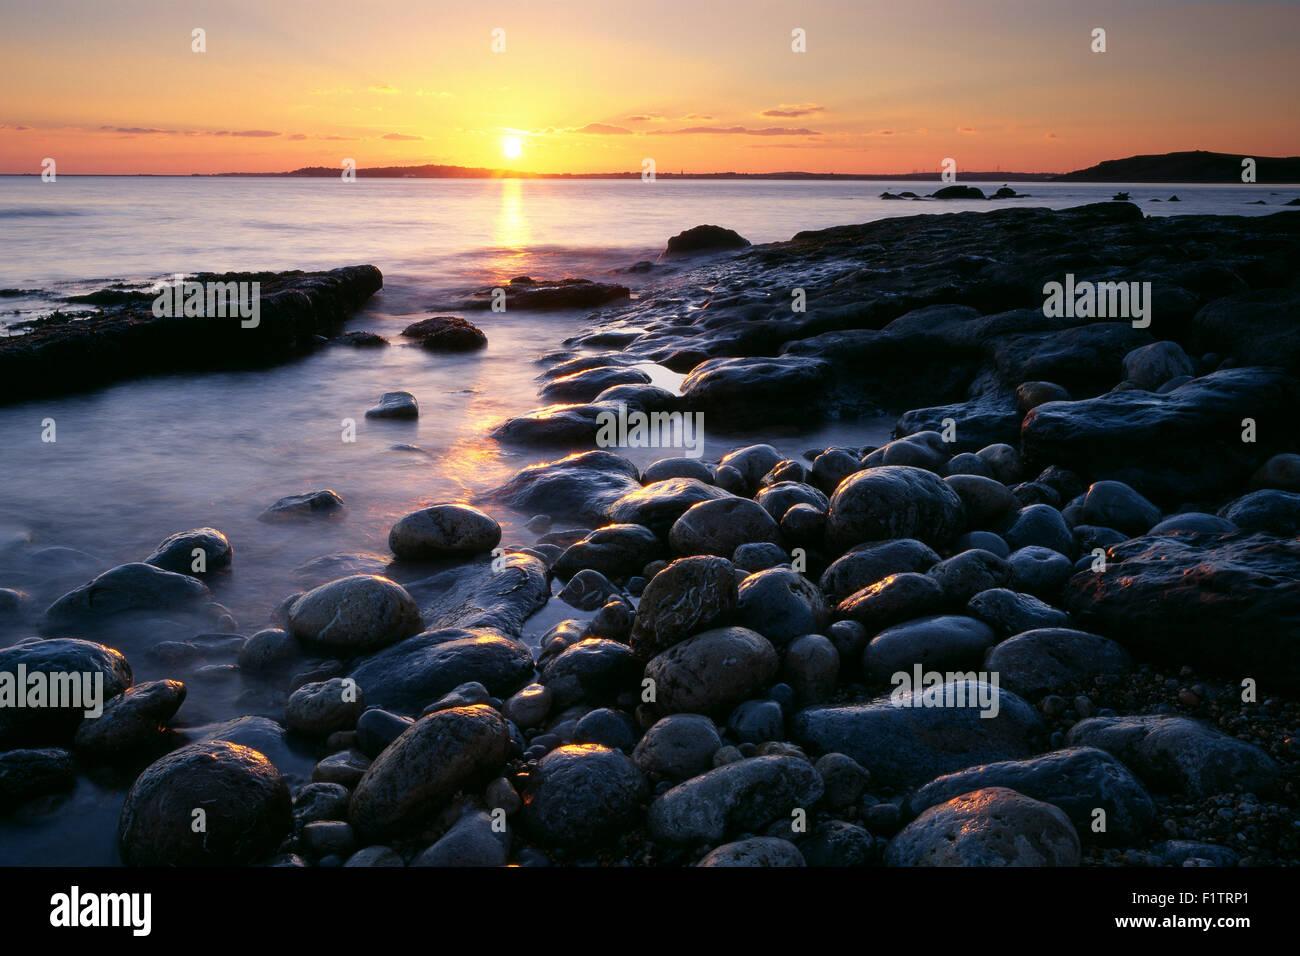 Coastline at Osmington Mills at sunset on Dorset's Jurassic Coast, England, UK. Stock Photo